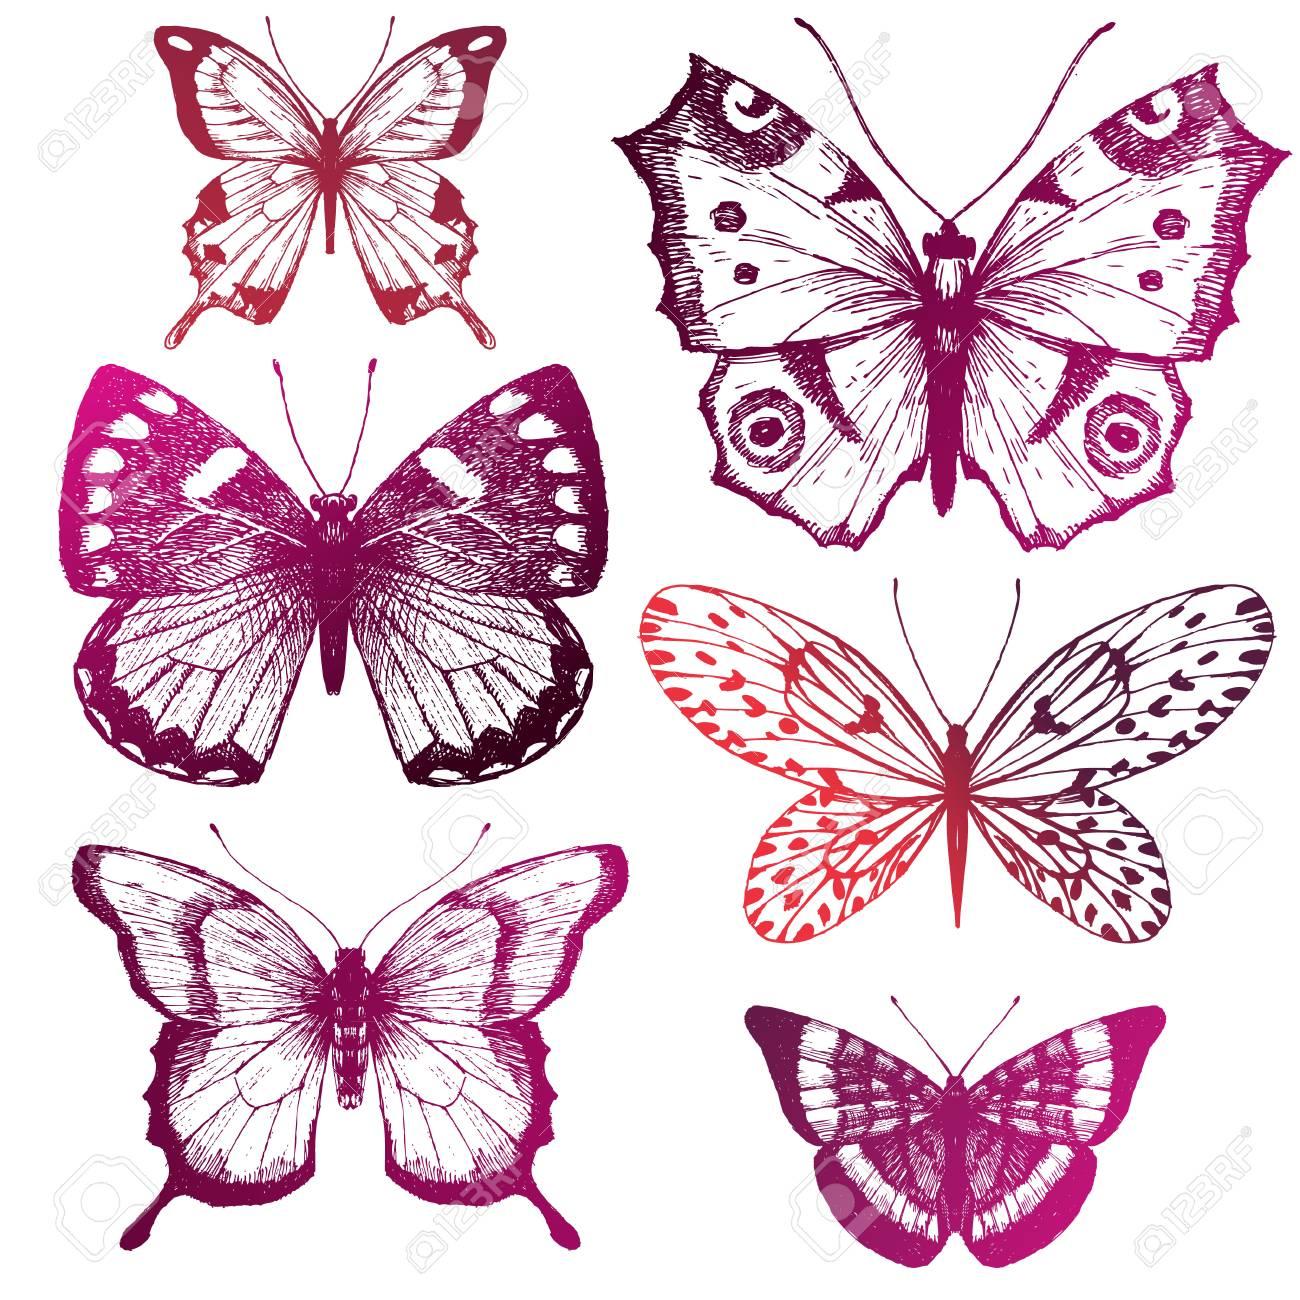 Beautiful image with six nice hand drawn butterflies - 55081846